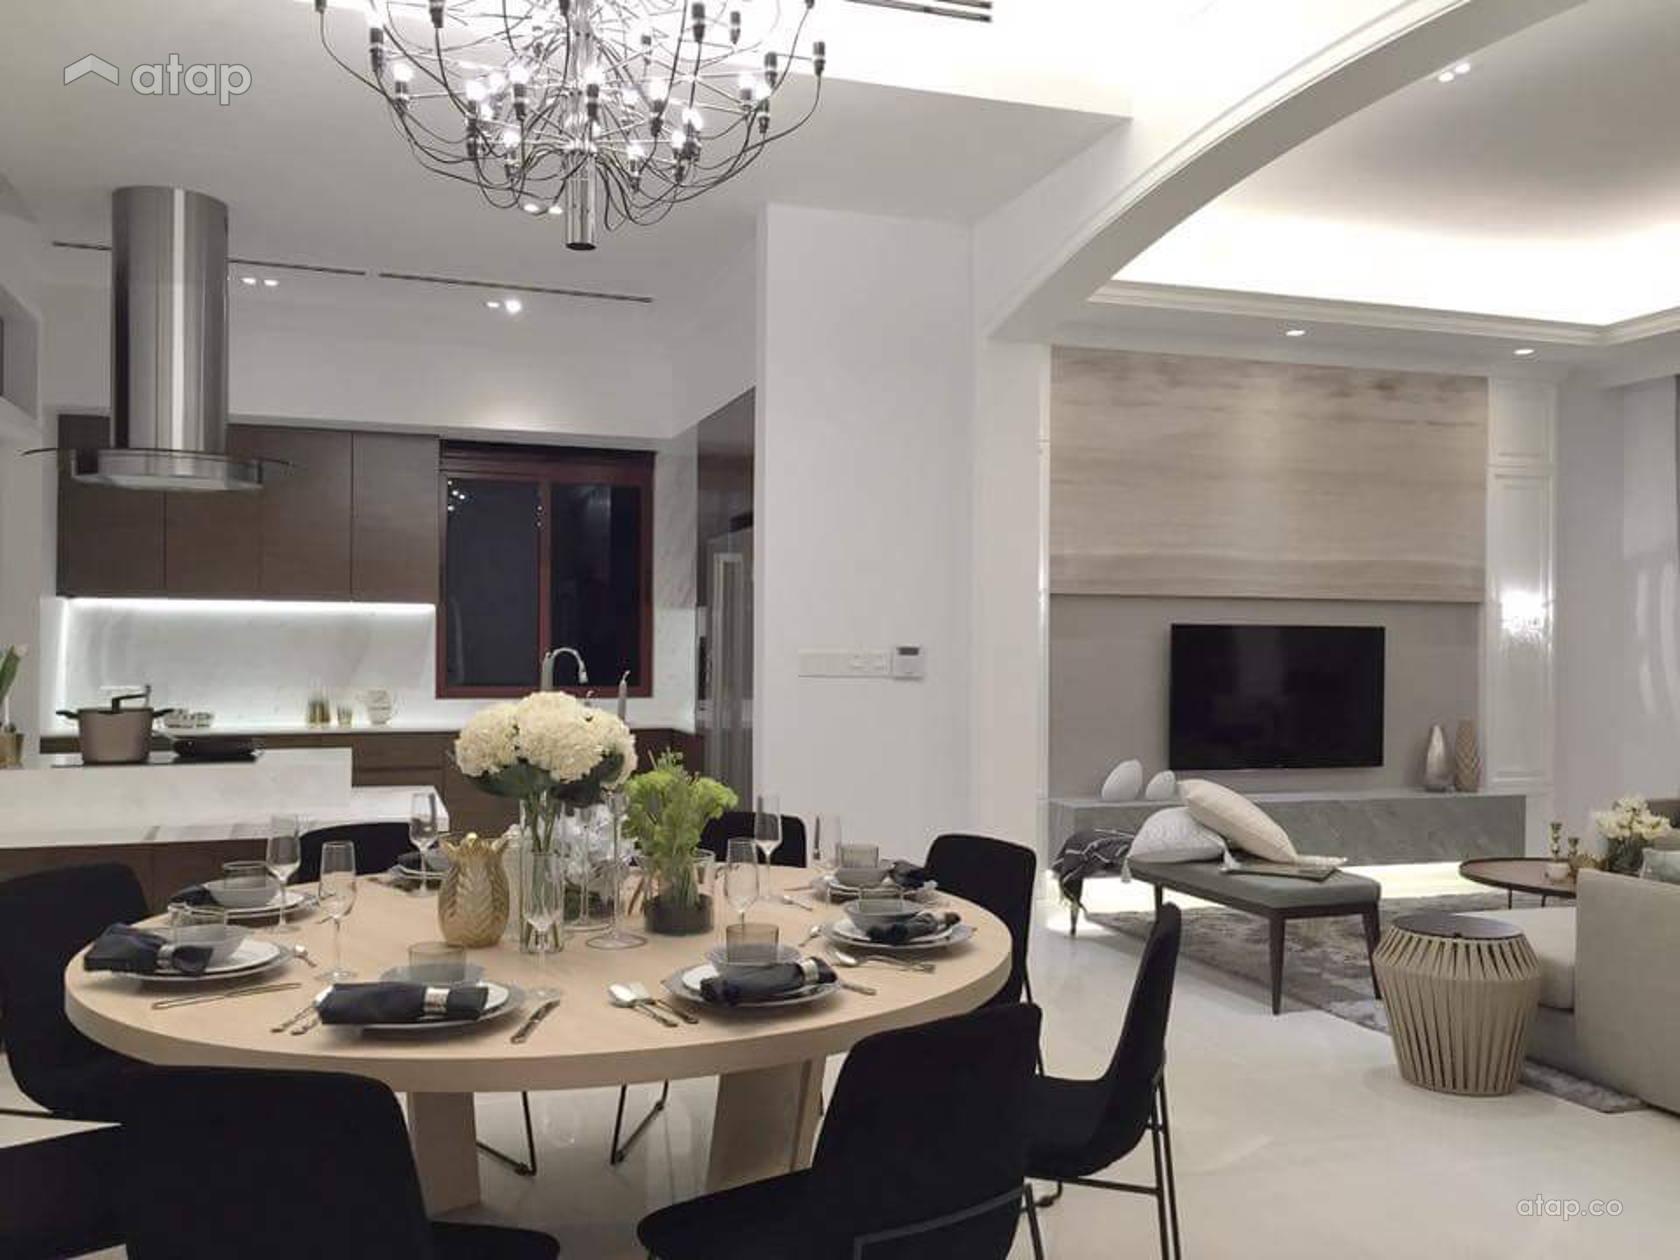 Classic Modern Dining Room Kitchen Bungalow Design Ideas Photos